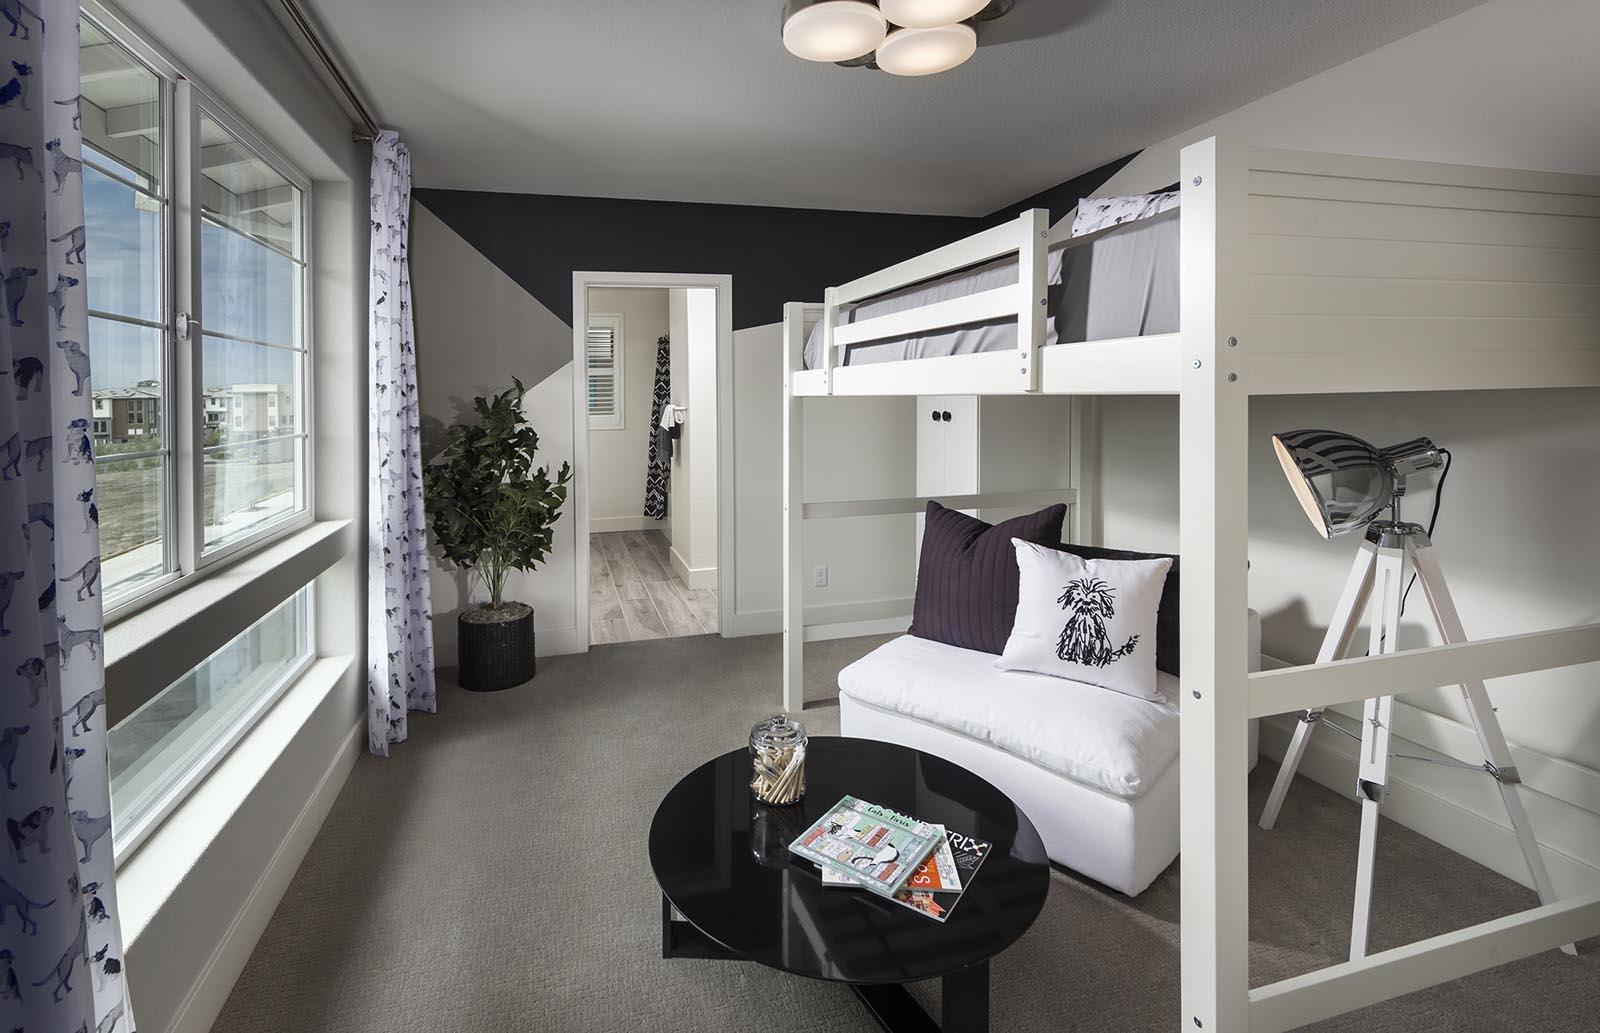 Bedroom 2 Residence 2 | Downing at Boulevard by Lennar, Dublin, CA